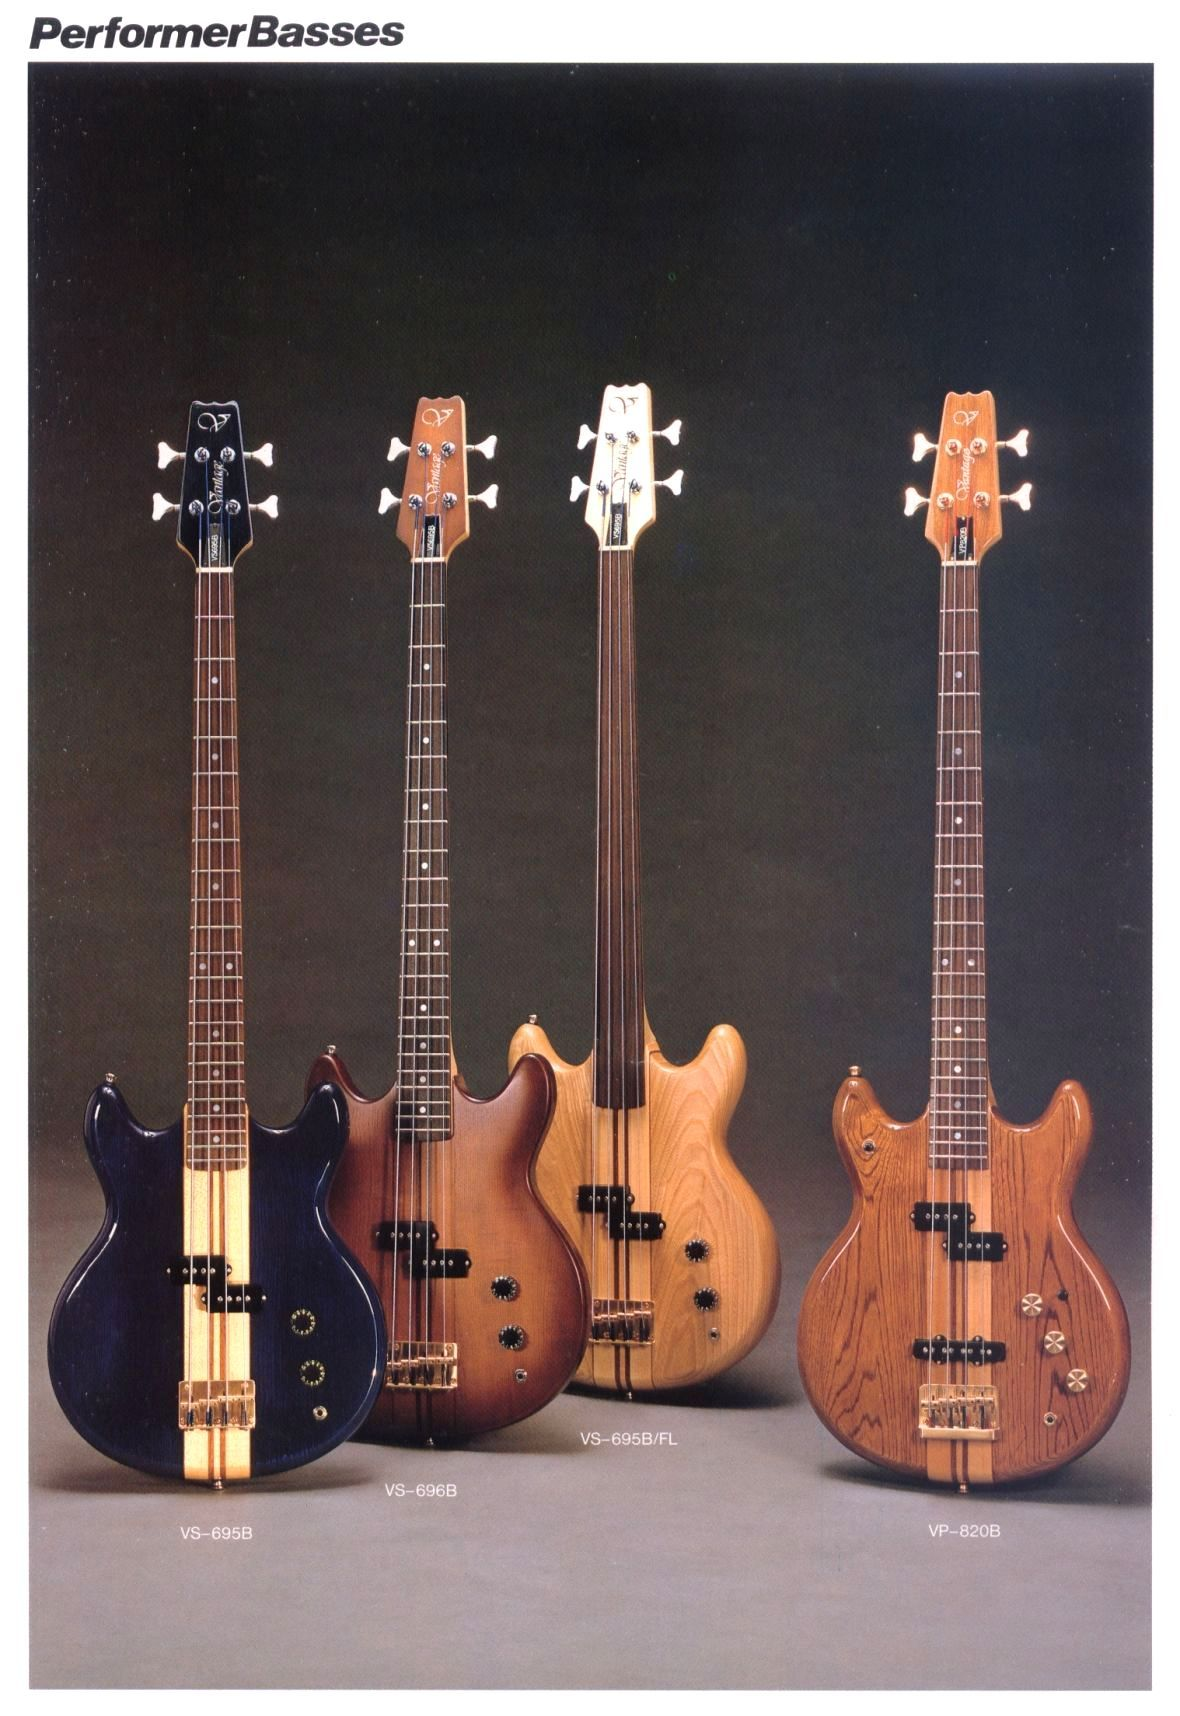 Vantage Performer Basses Matsumoku Guitar Bass Guitar Bass Guitar Lessons